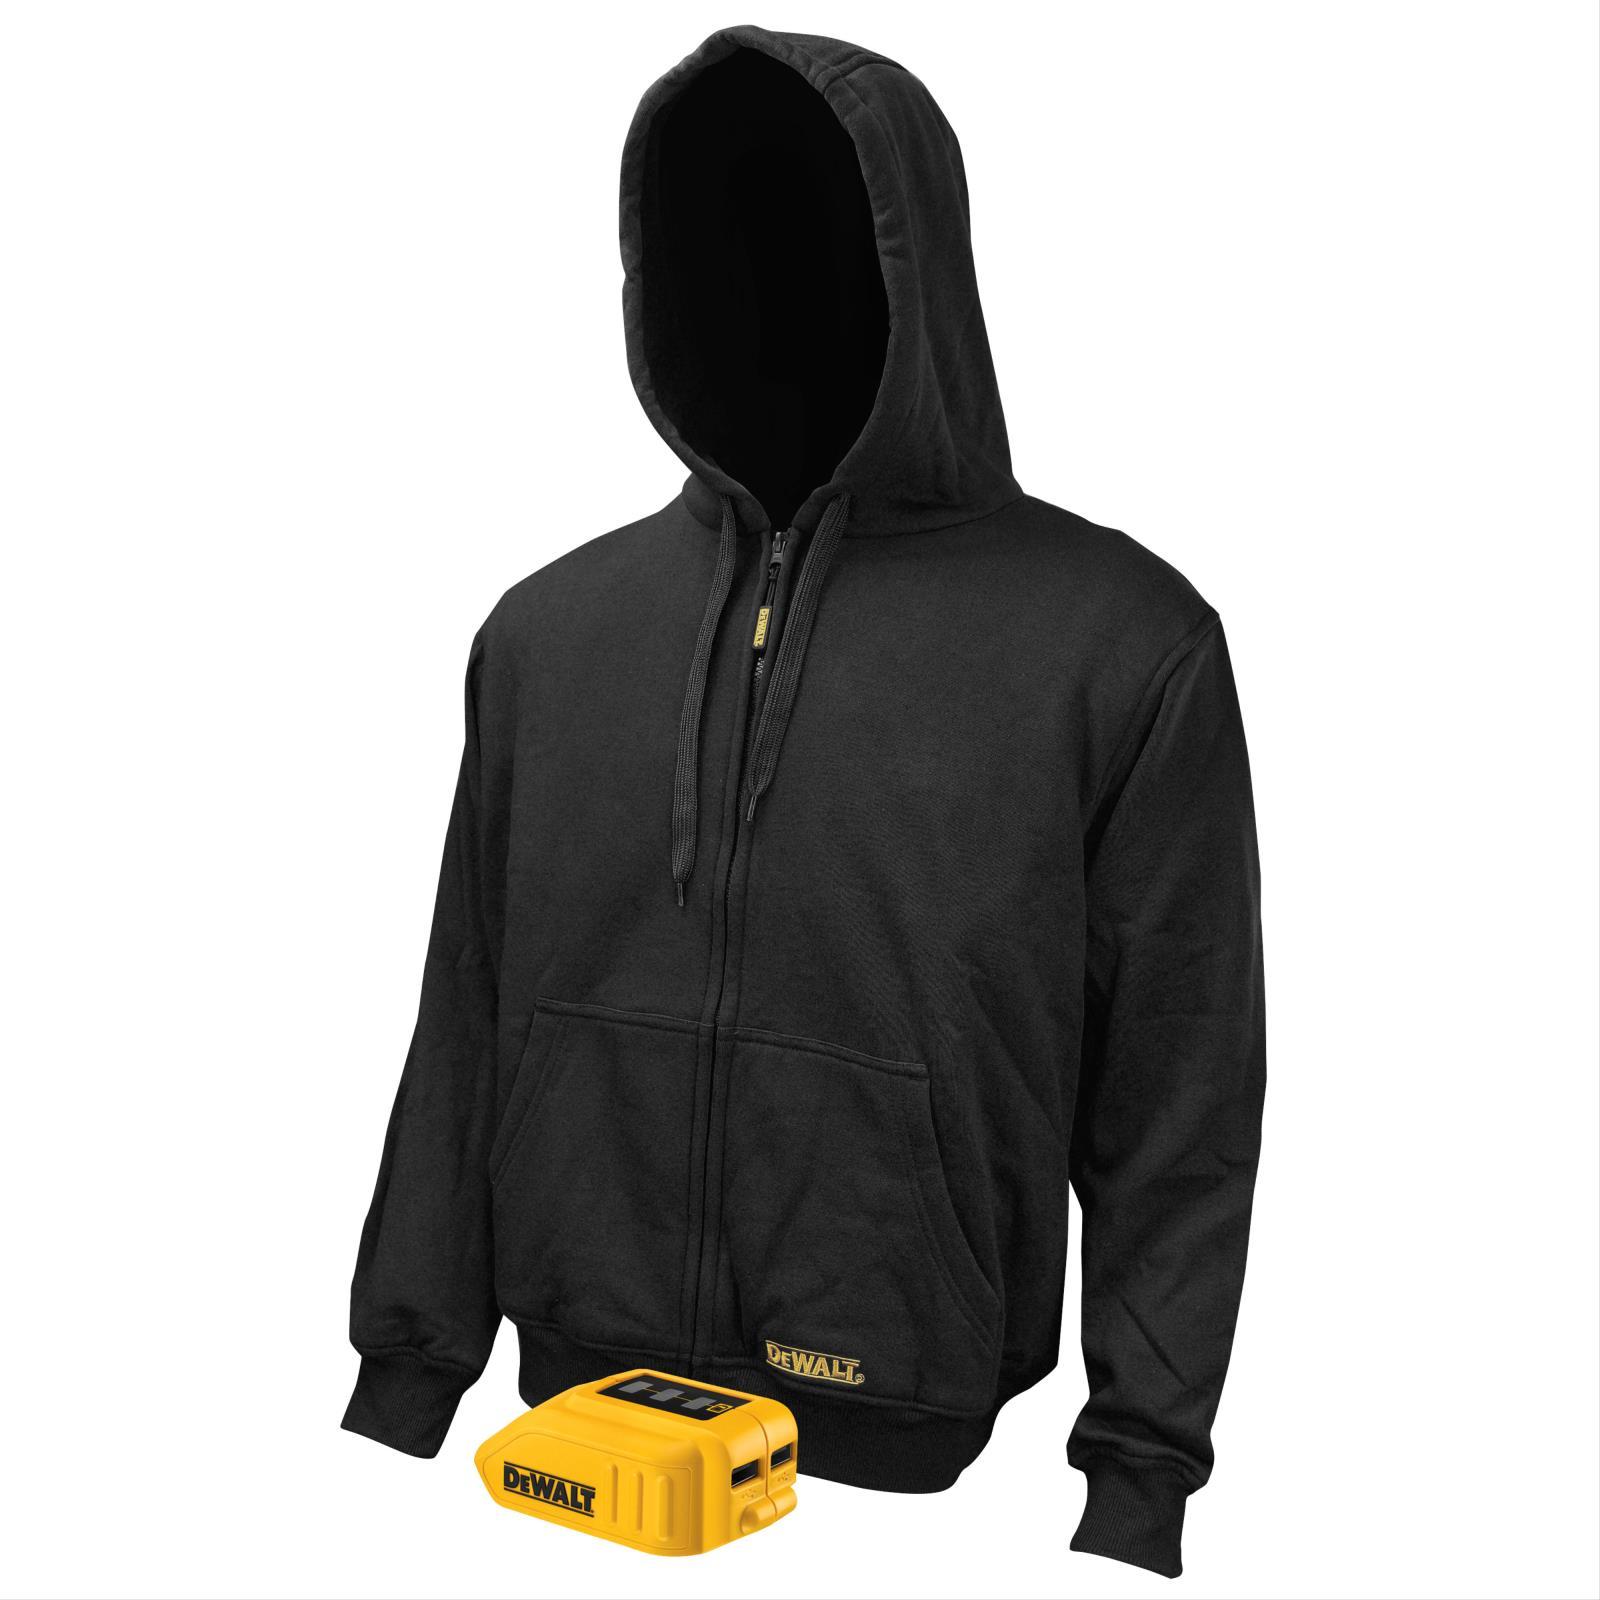 Safety Products Inc - DeWalt® Black Heated Hoodie